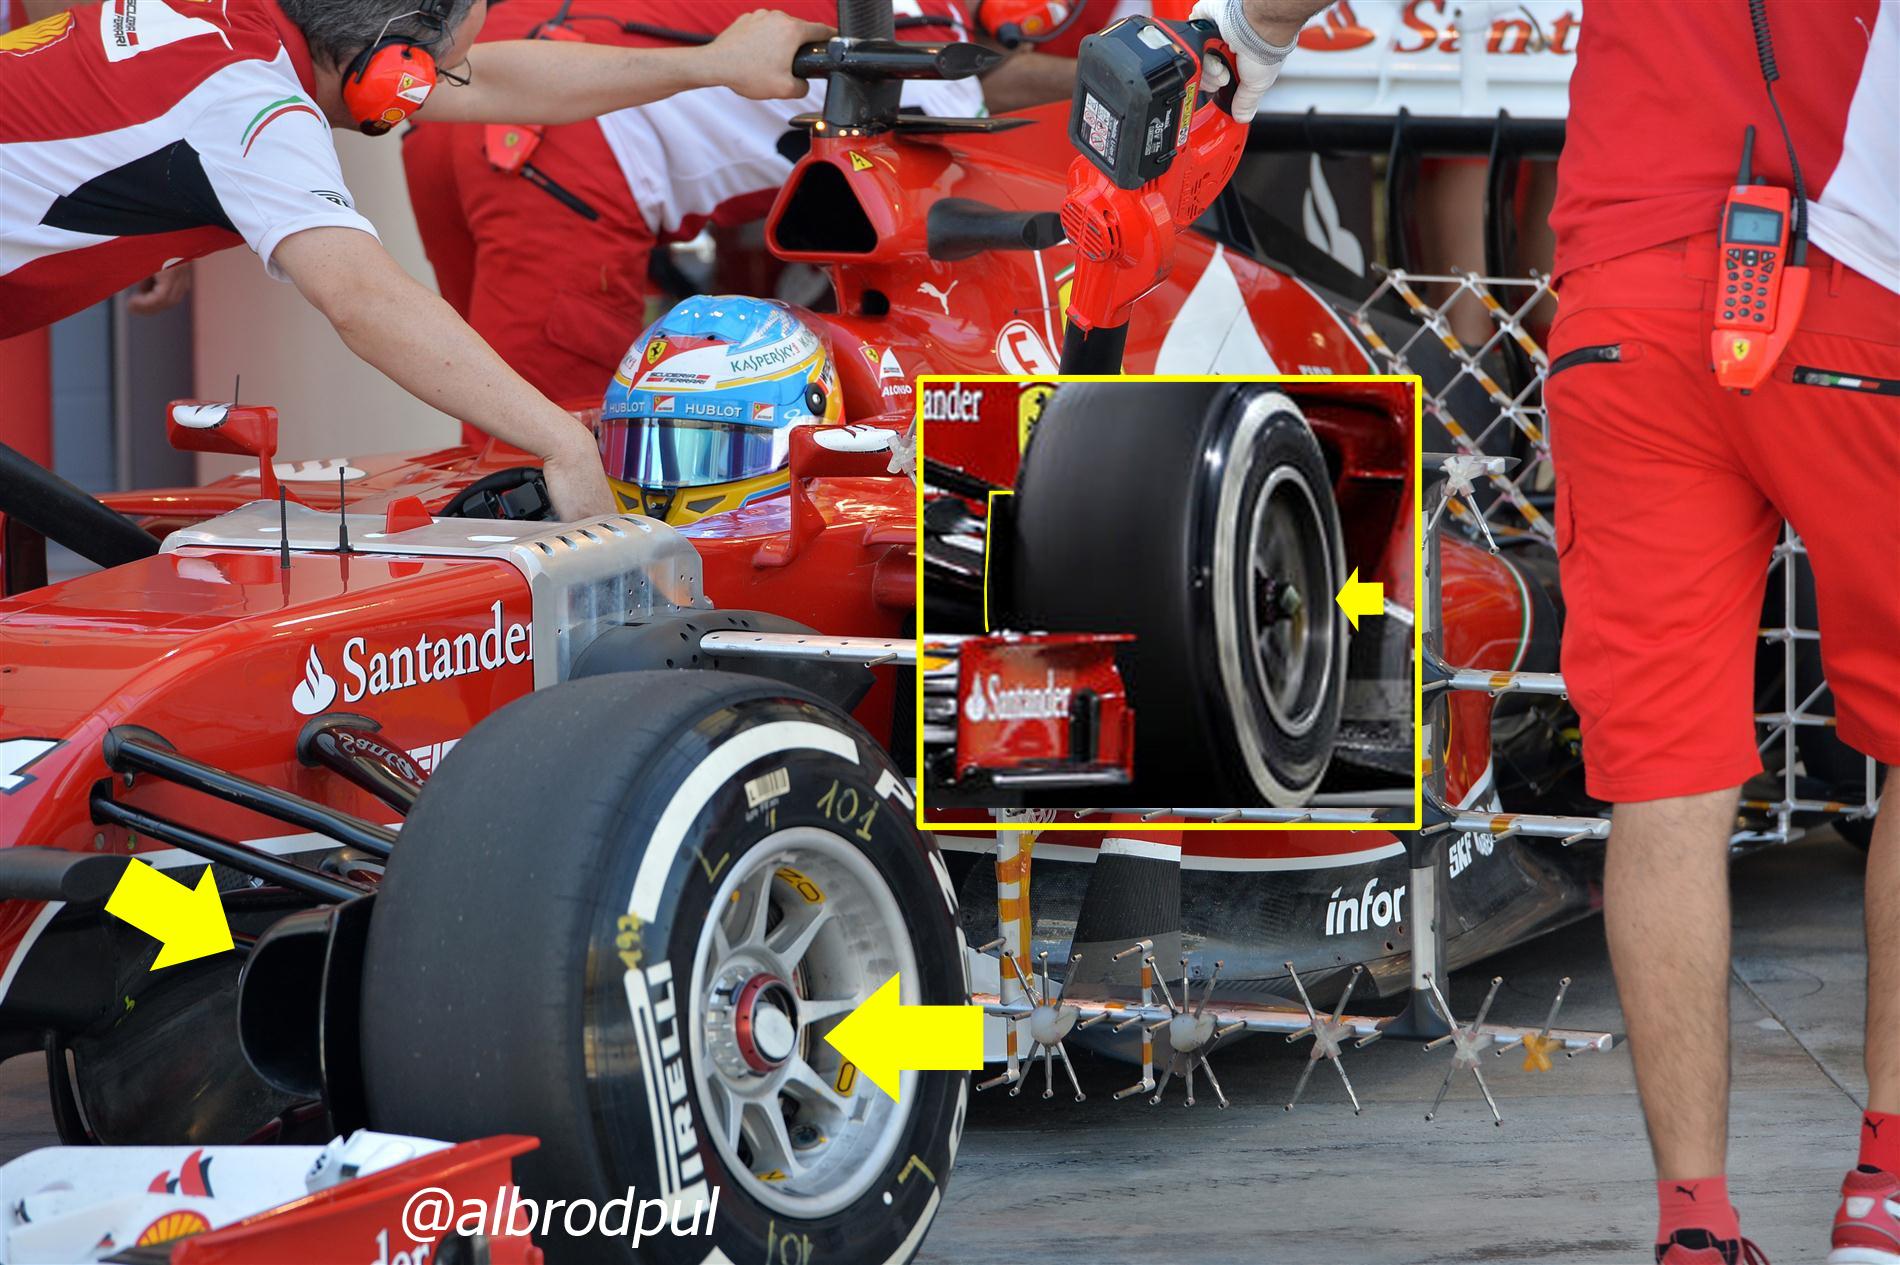 f14t-brakes